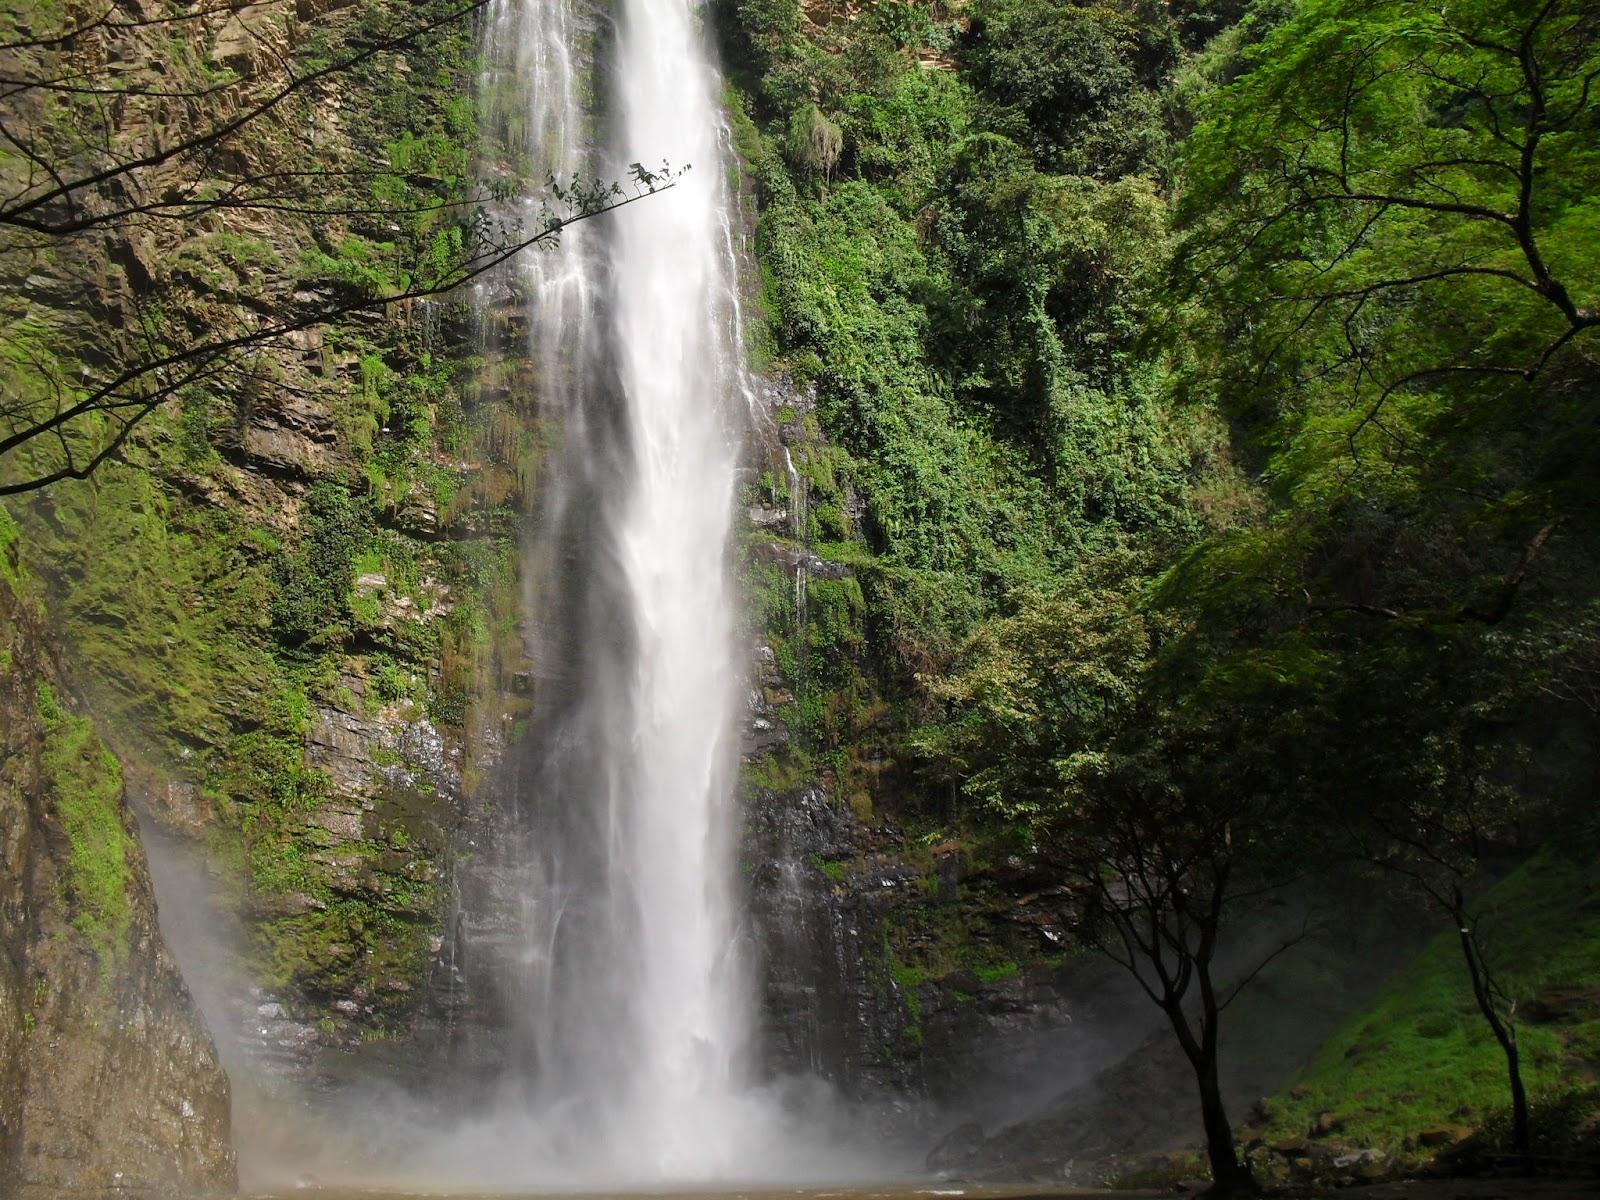 Wli_Waterfall_1.jpg